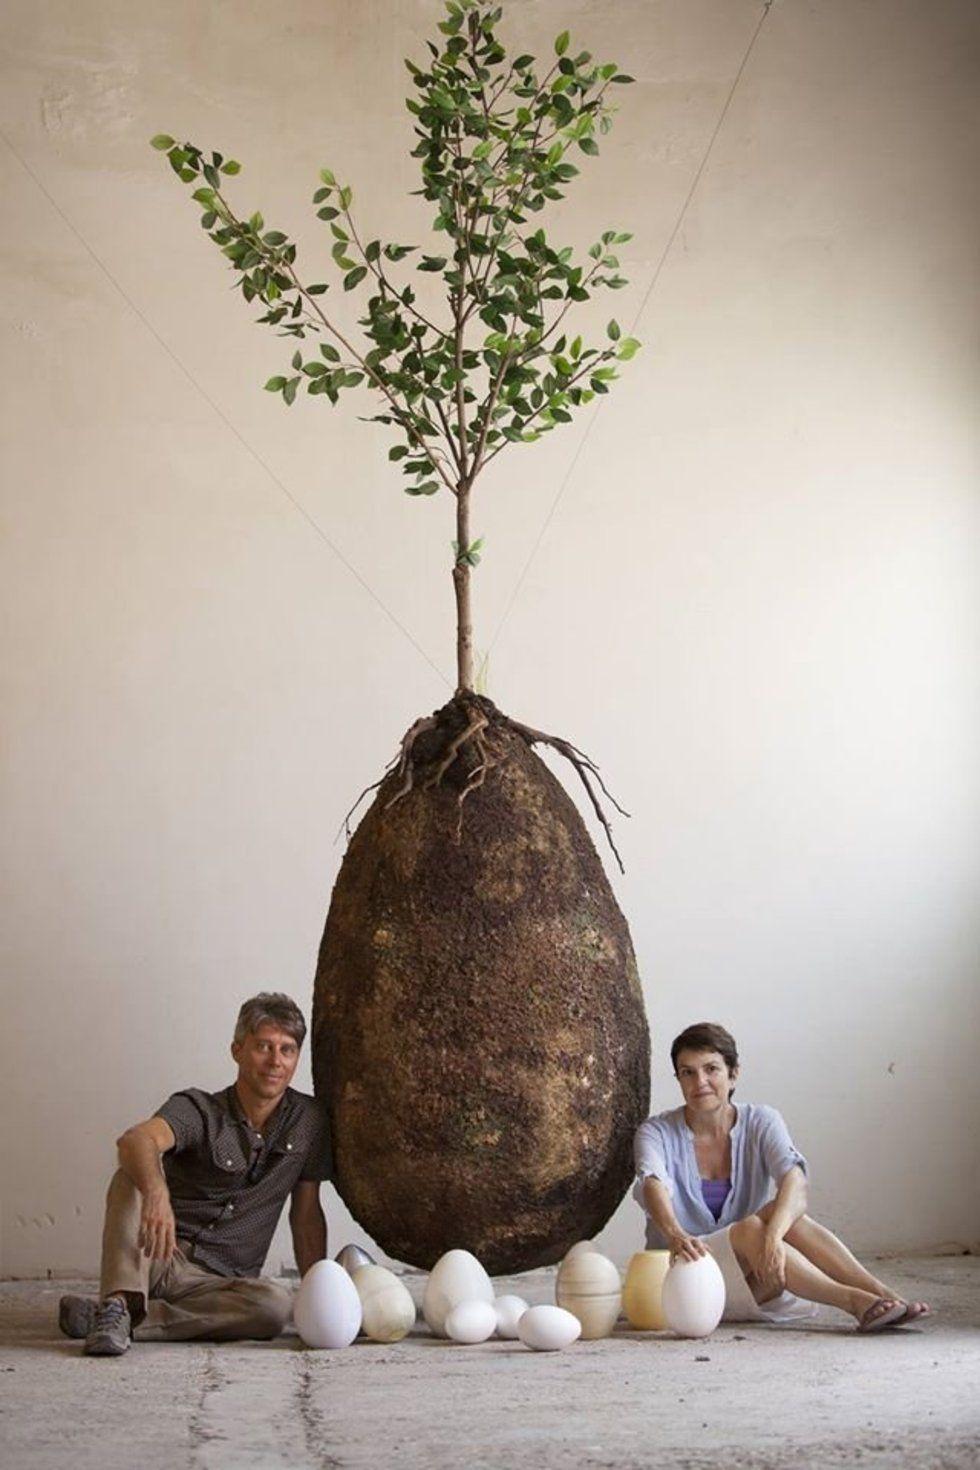 De Italiaanse designers van de Capsula Mundi: Anna Citelli en Raoul Bretzel